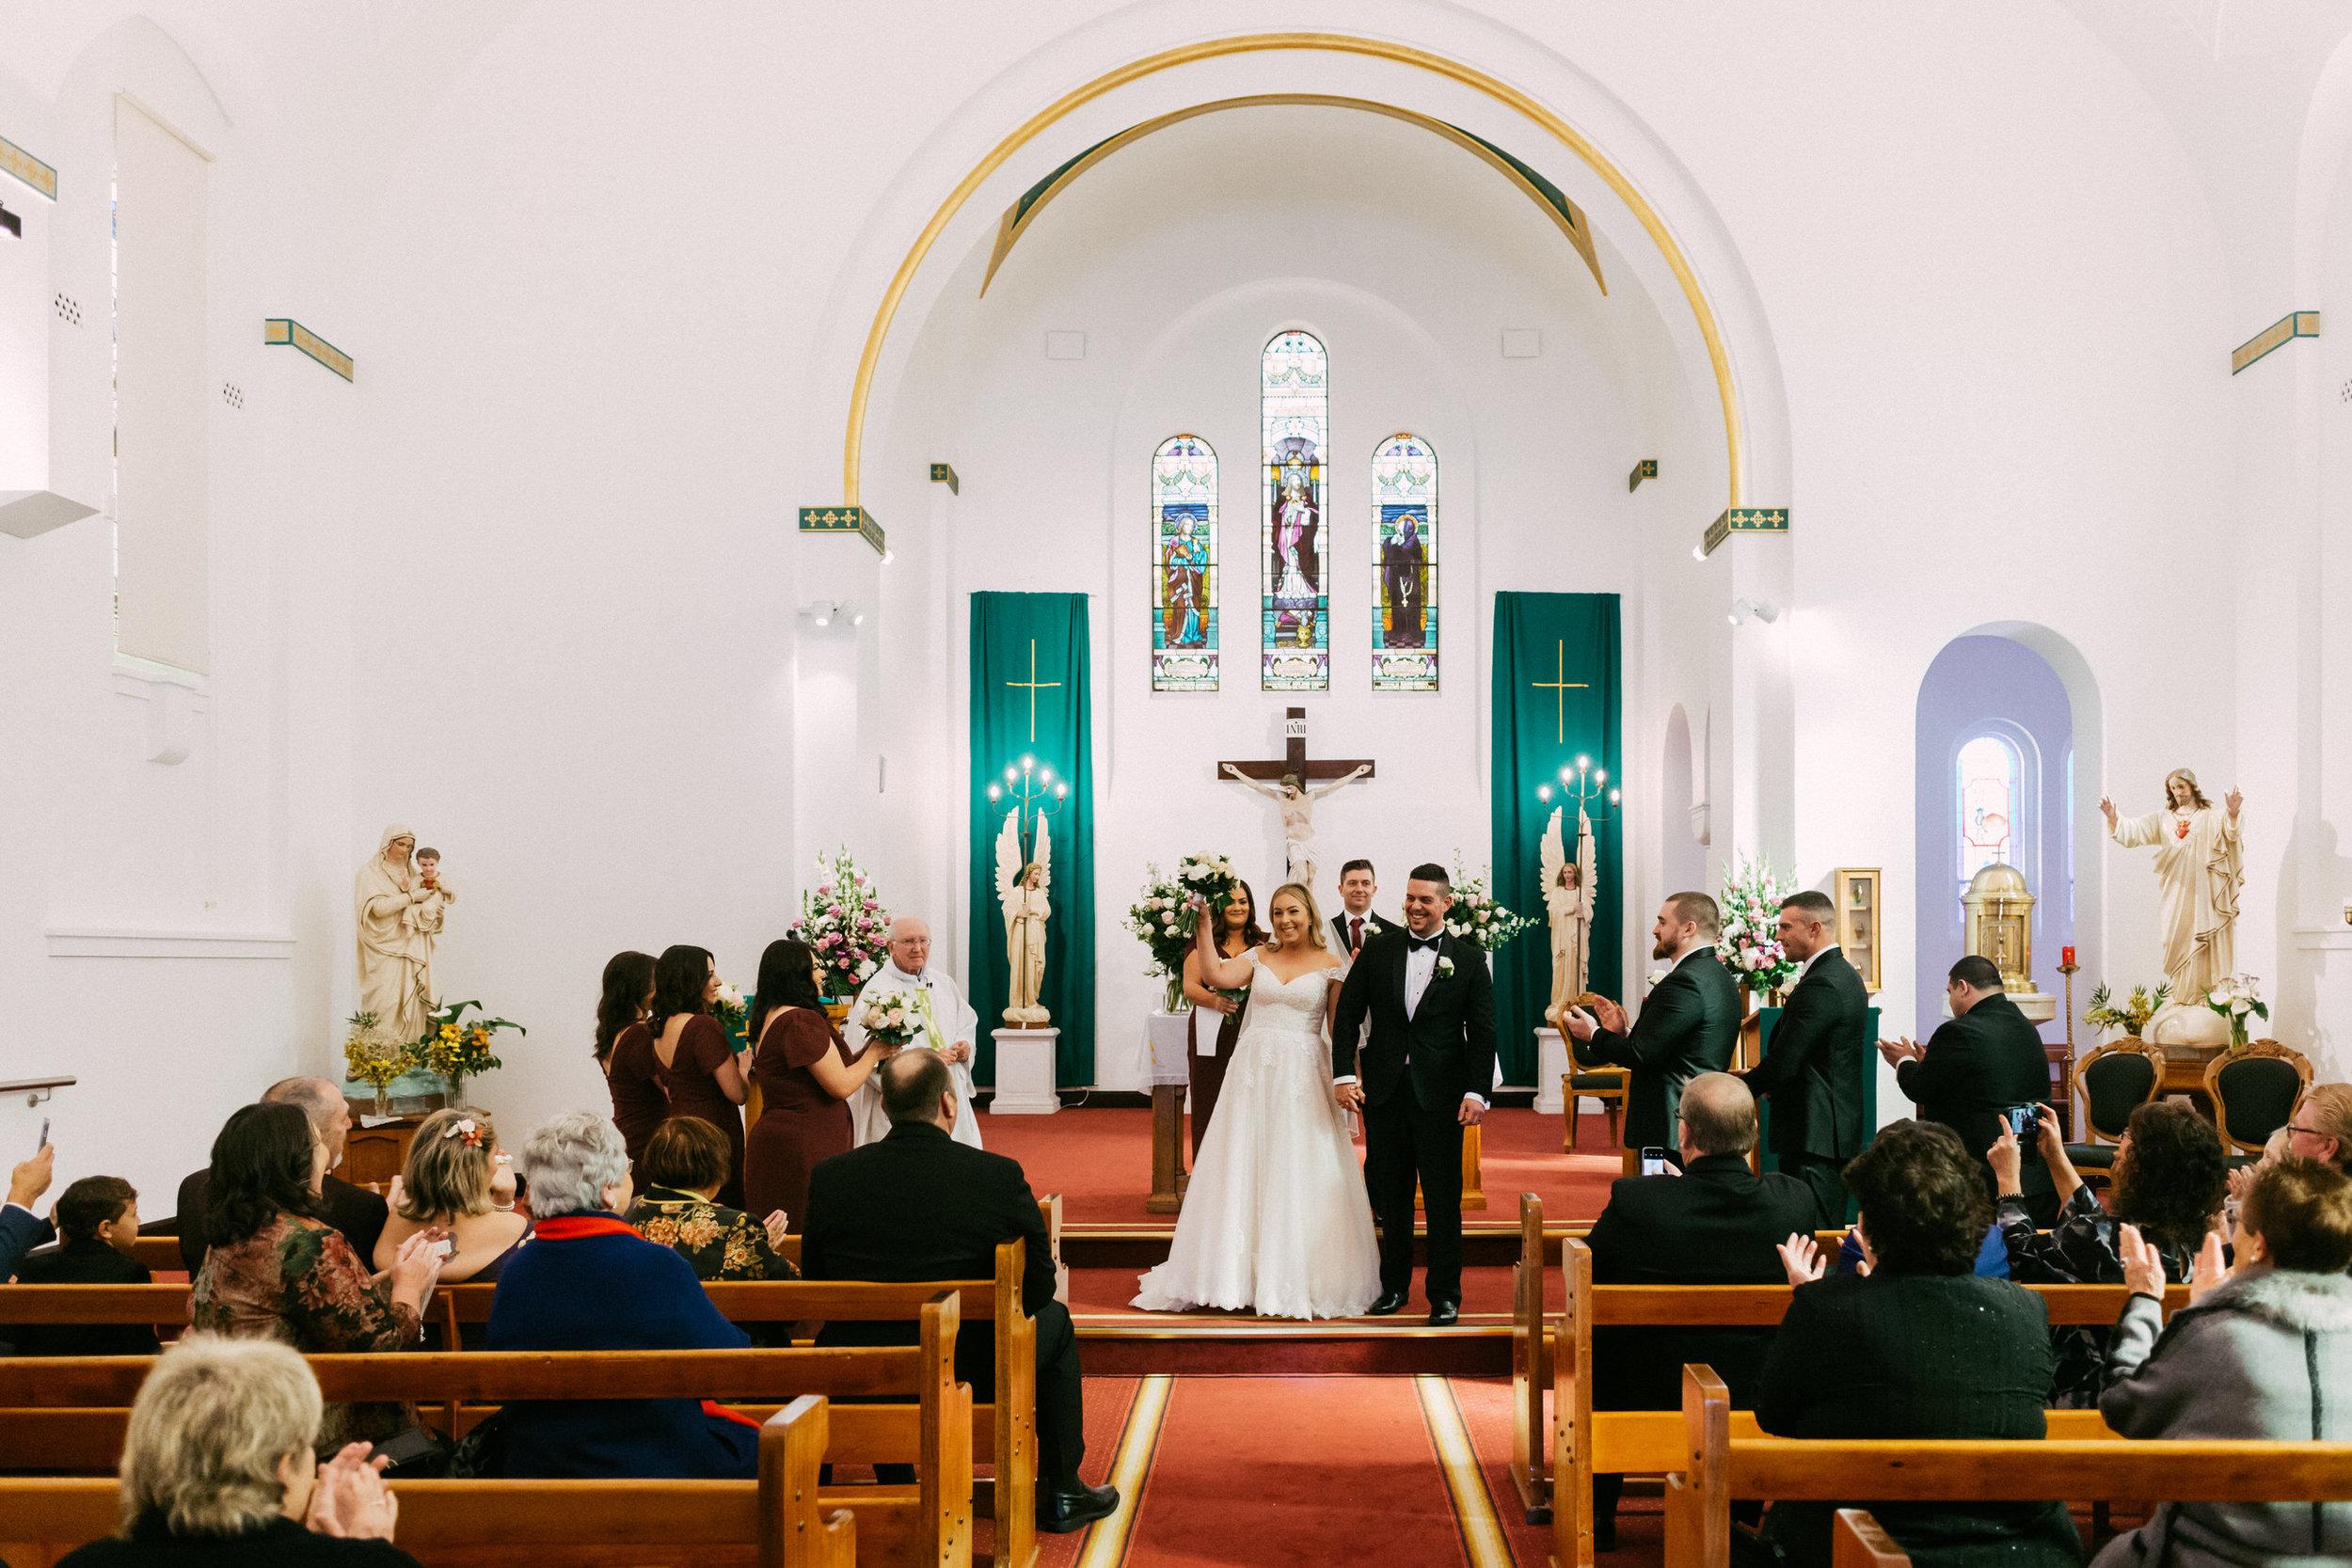 Adelaide Wedding Church Smoke Bomb Serafino 075.jpg